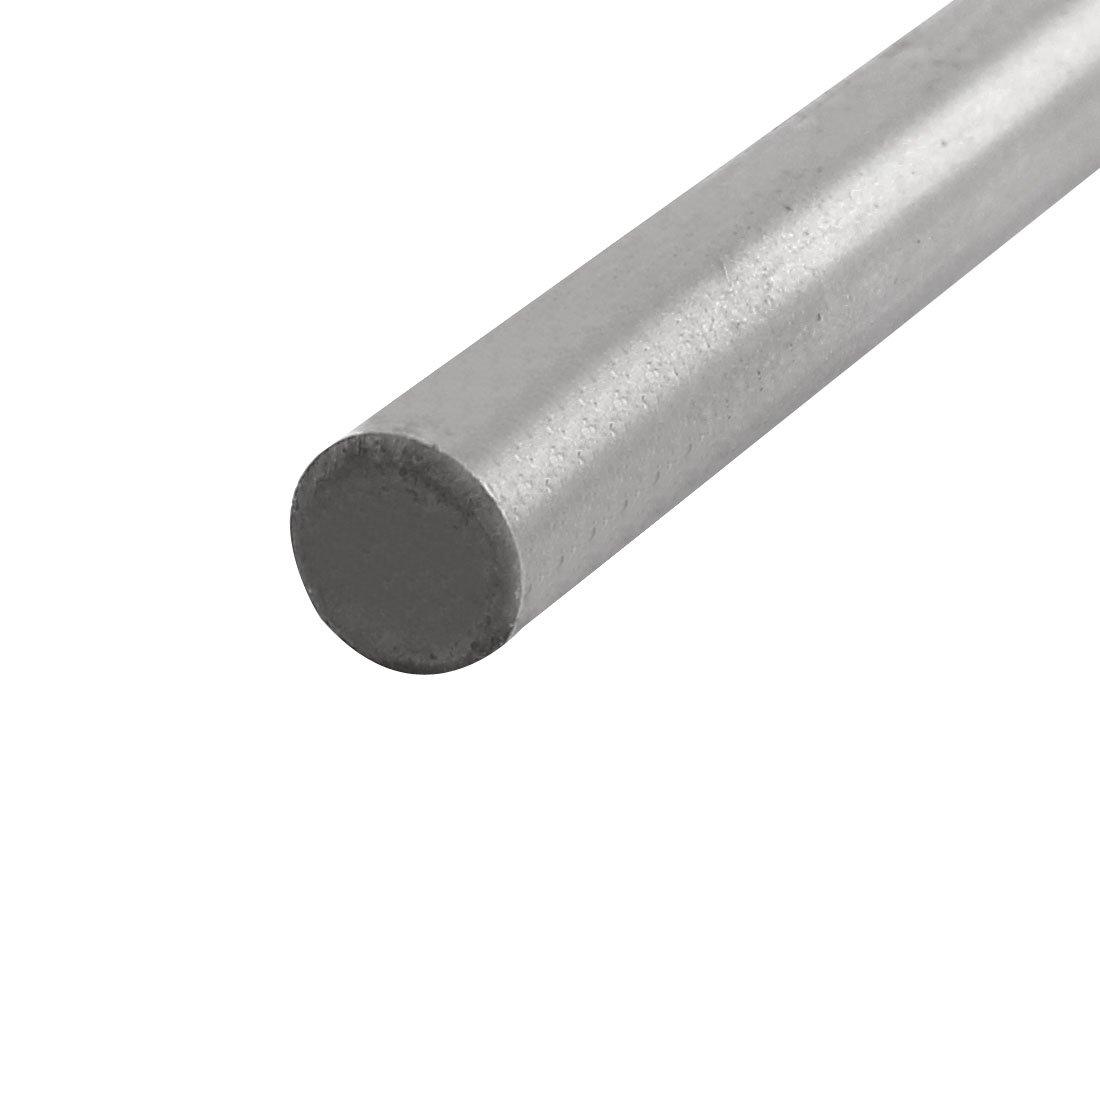 uxcell 12mm Drilling Dia 400mm Length HSS Round Shank Twist Drill Bit Silver Tone